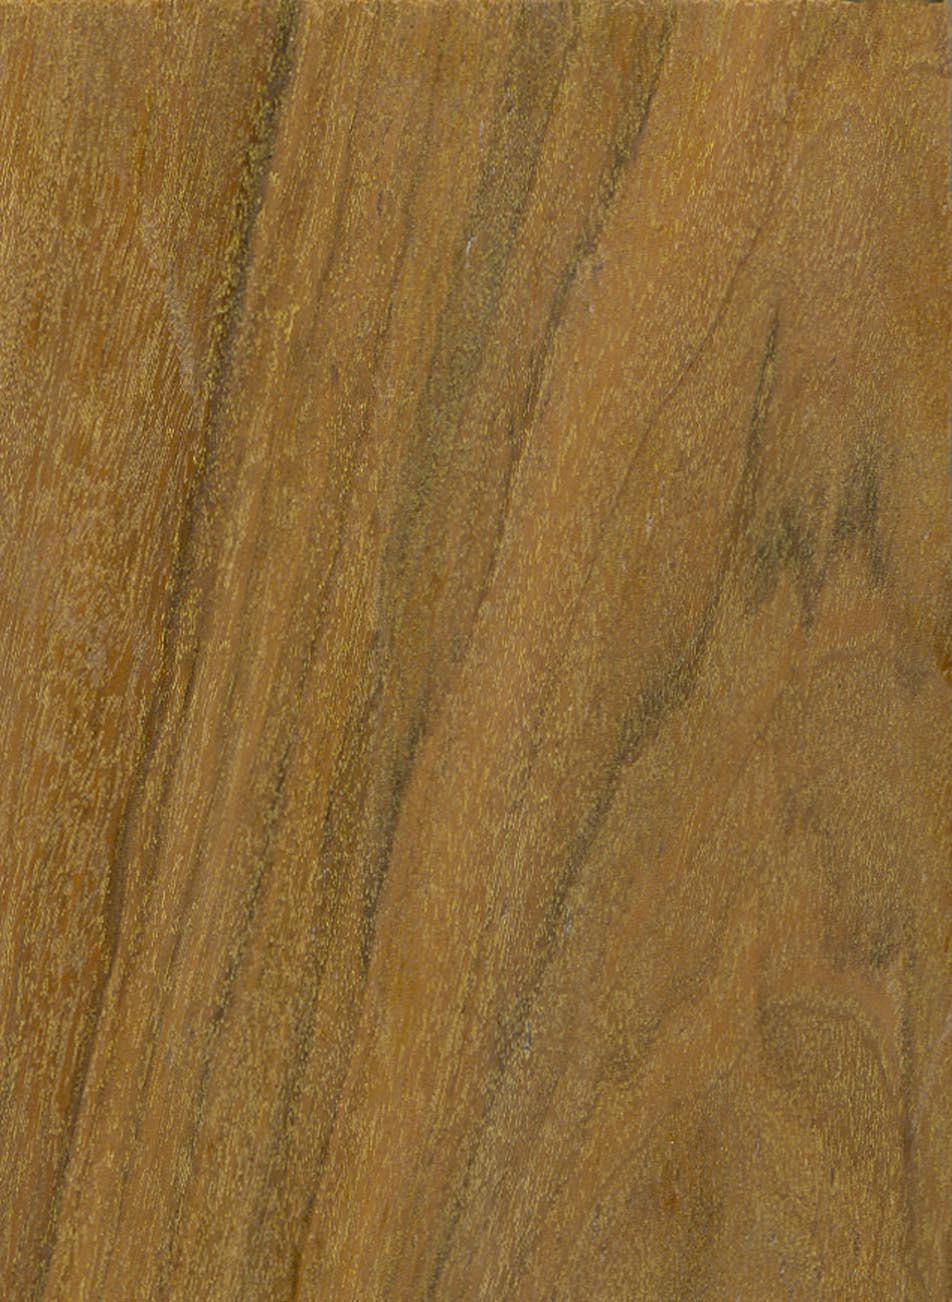 Ipe Merkmale Eigenschaften Holz Vom Fach